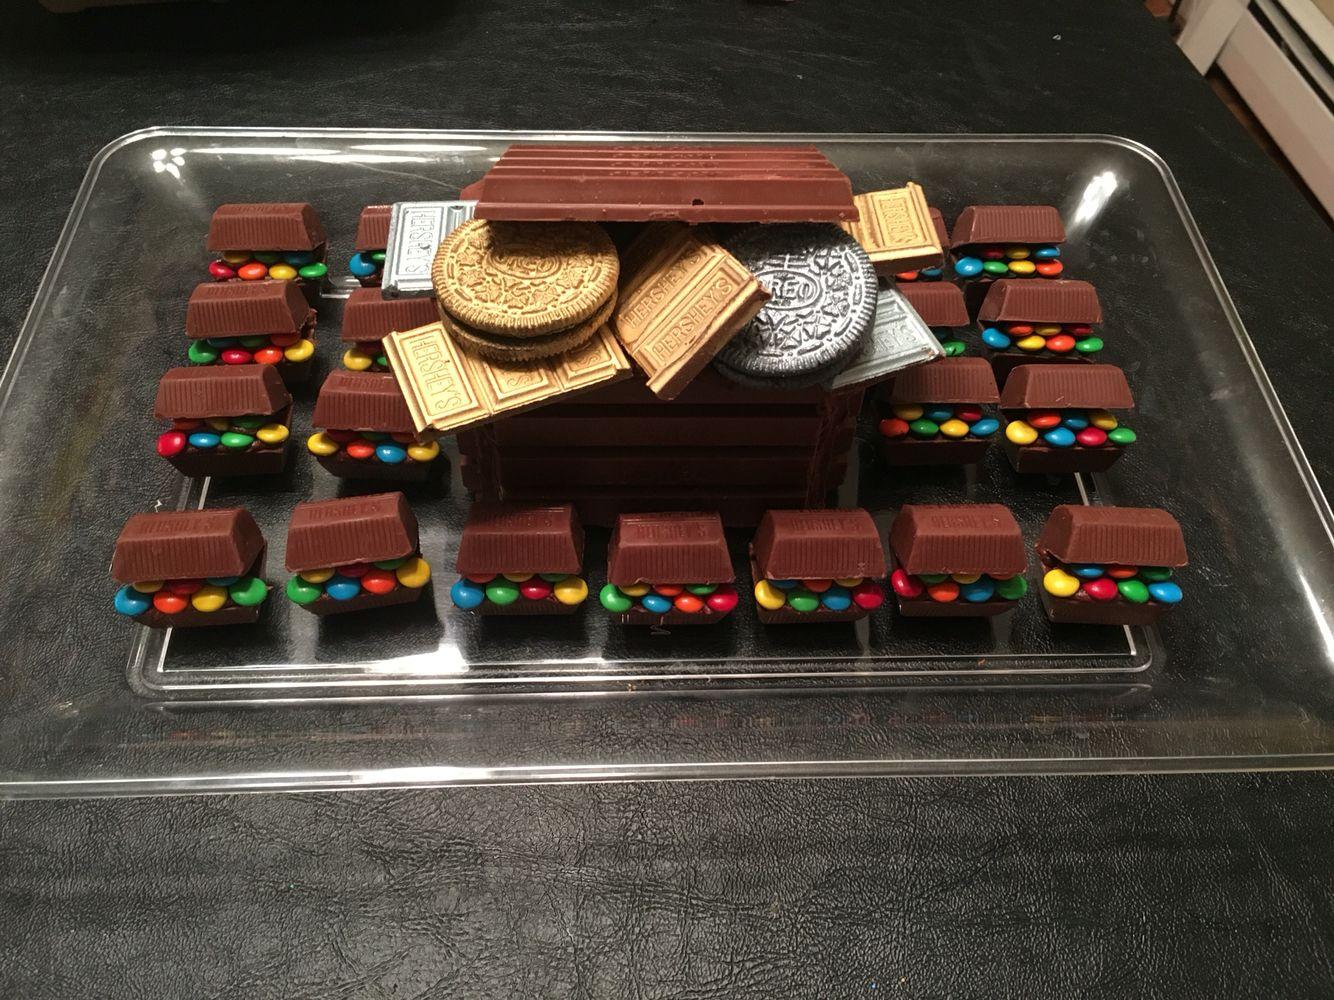 Kit Kat Treasure Chest & Hershey's Nuggets Treasure Chests with ...